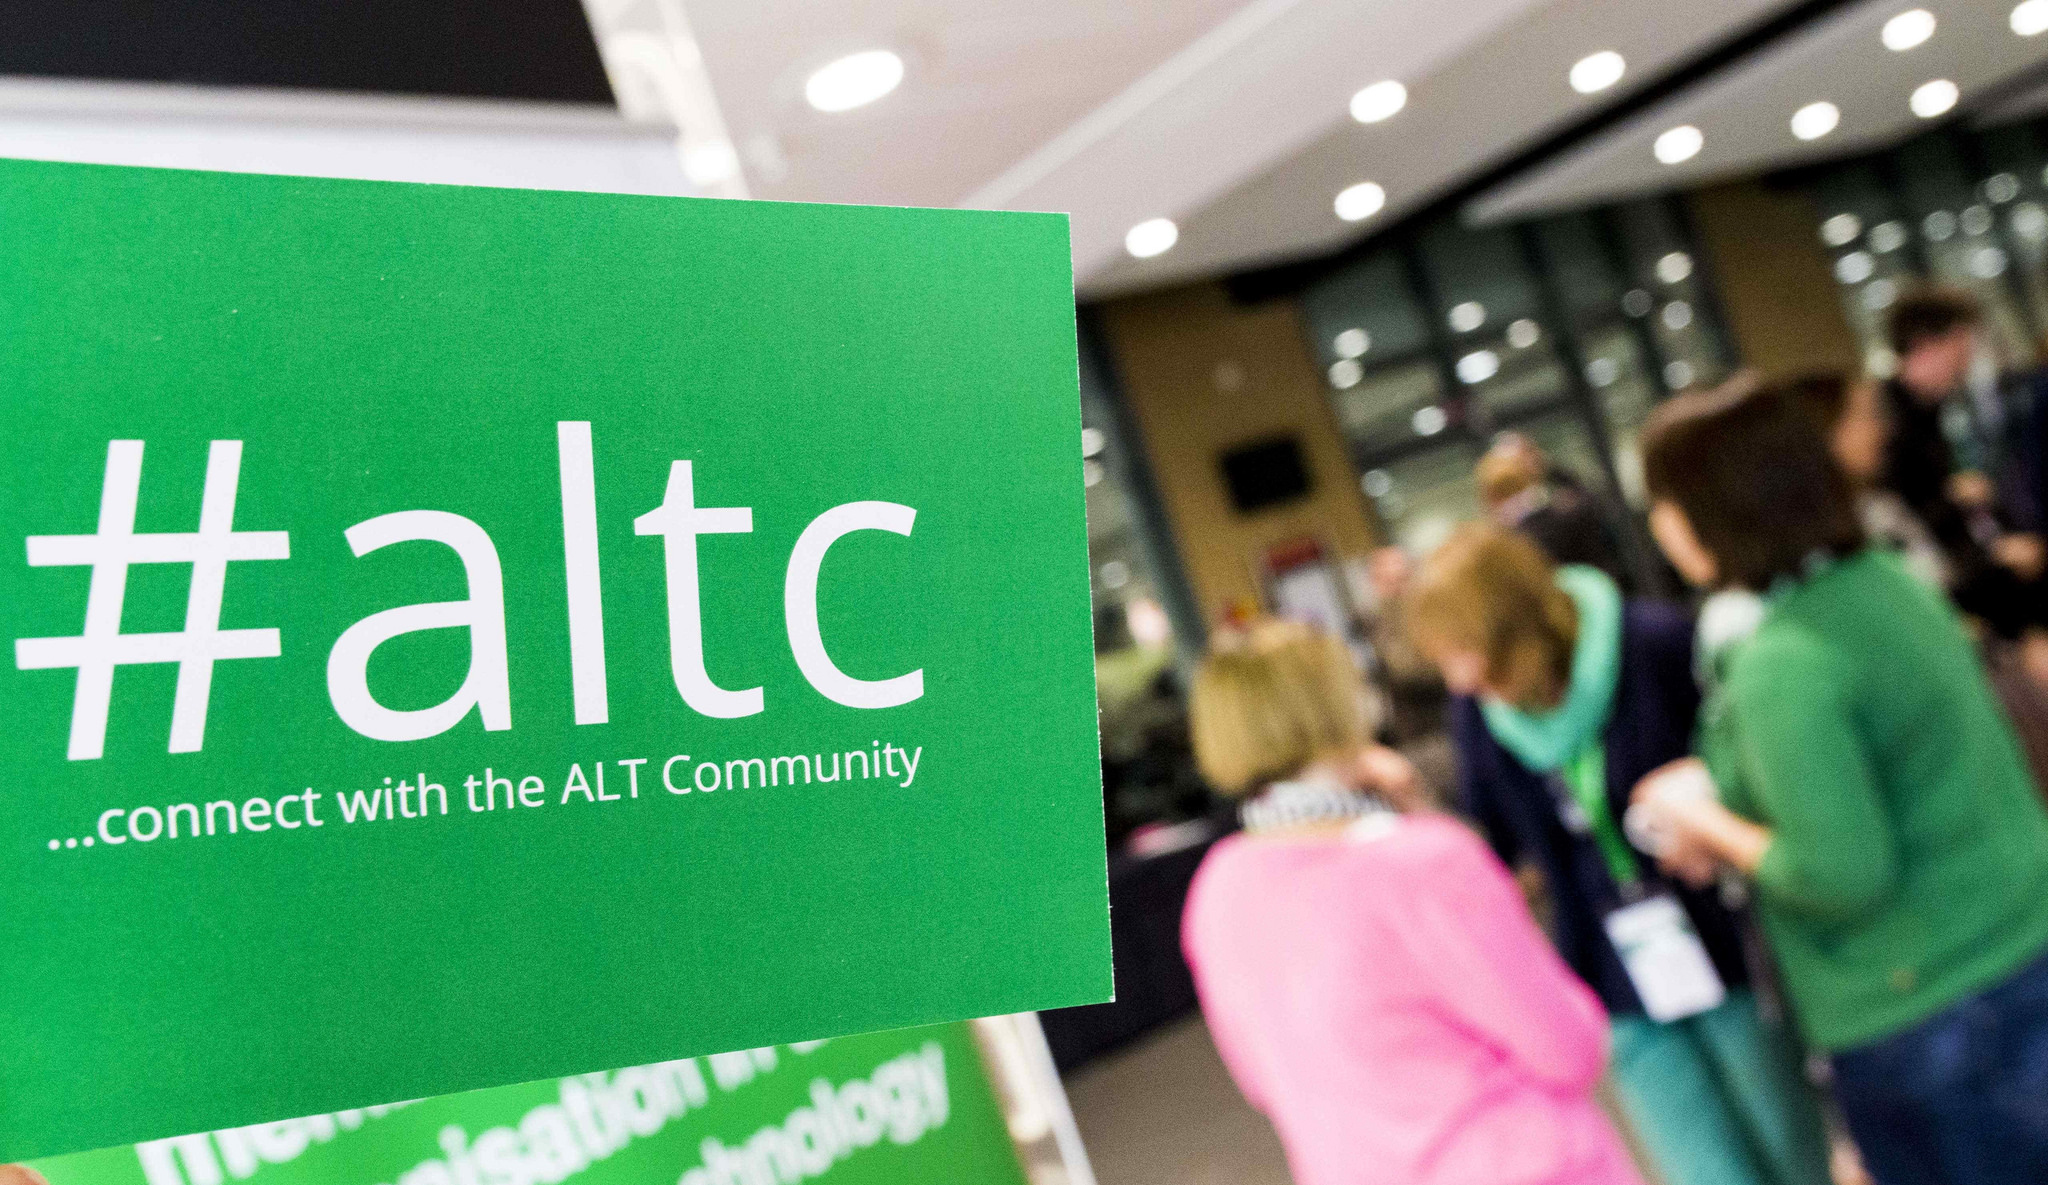 #altc ... connect with the ALT community